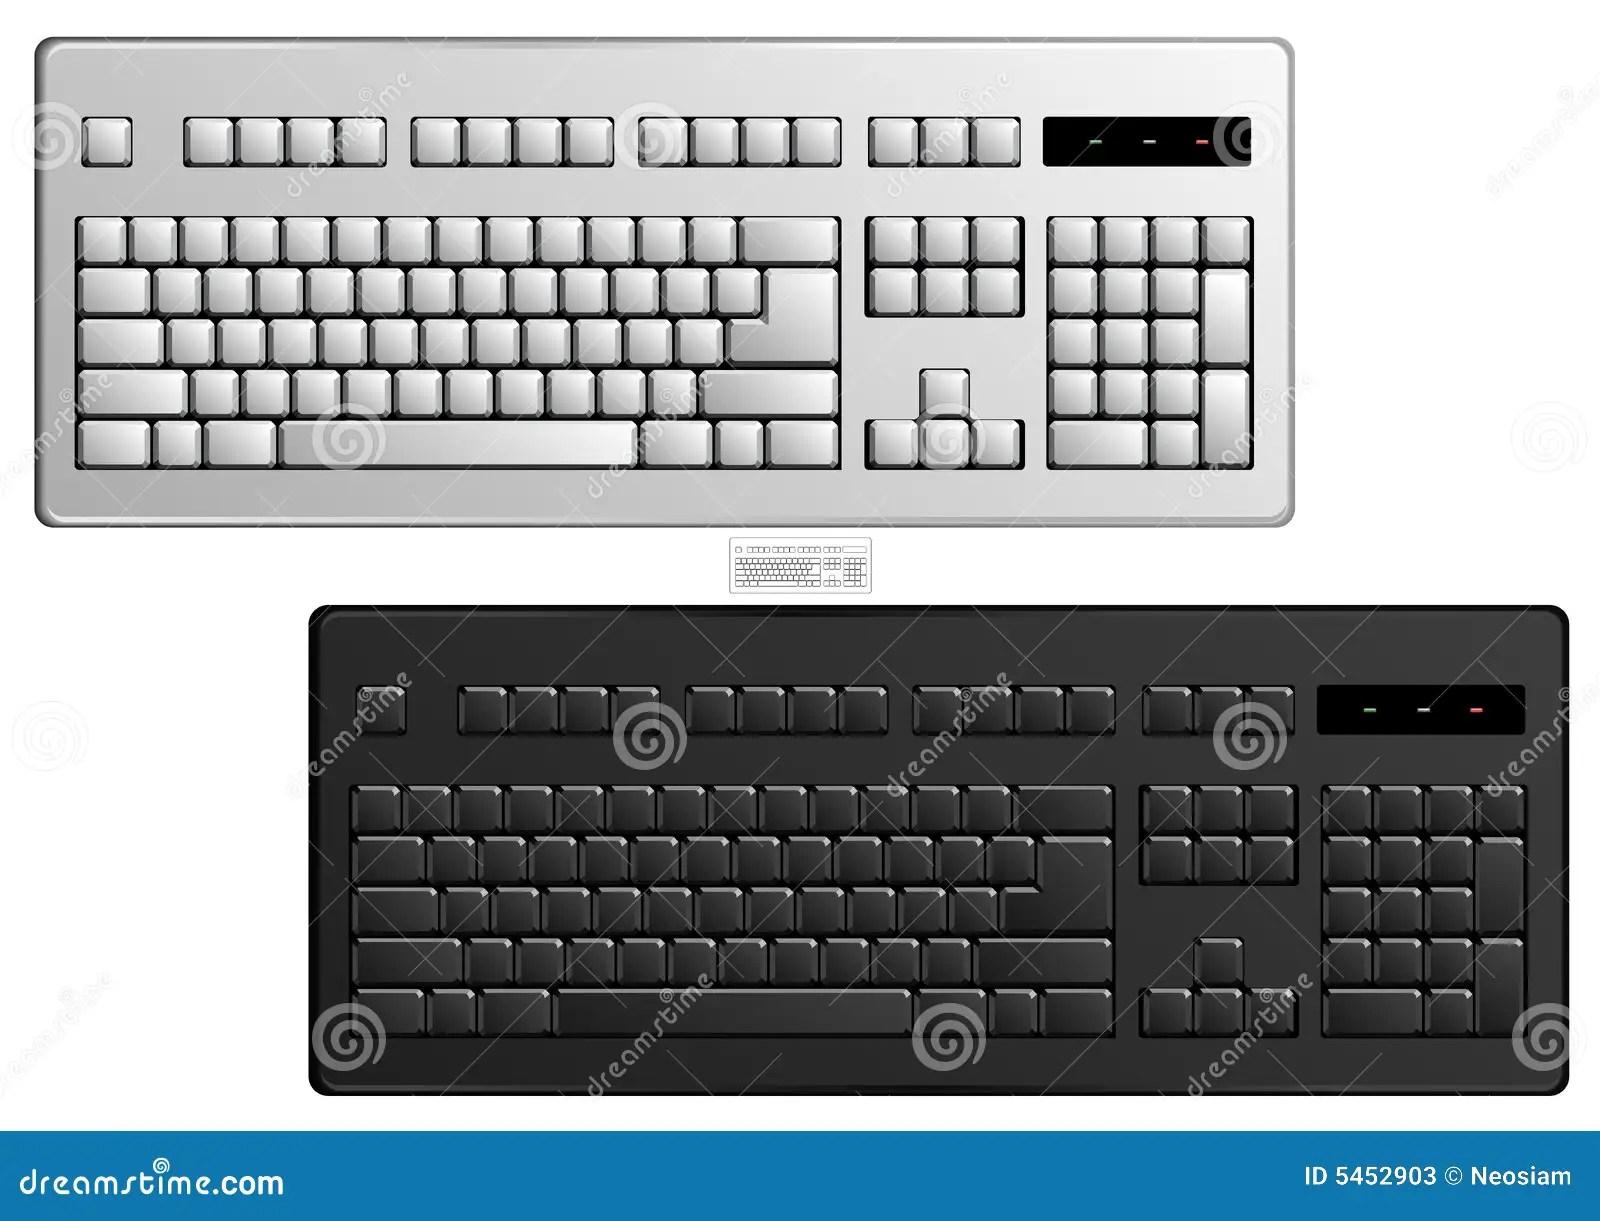 Basic Computer Keyboard Vector Art Stock Photos